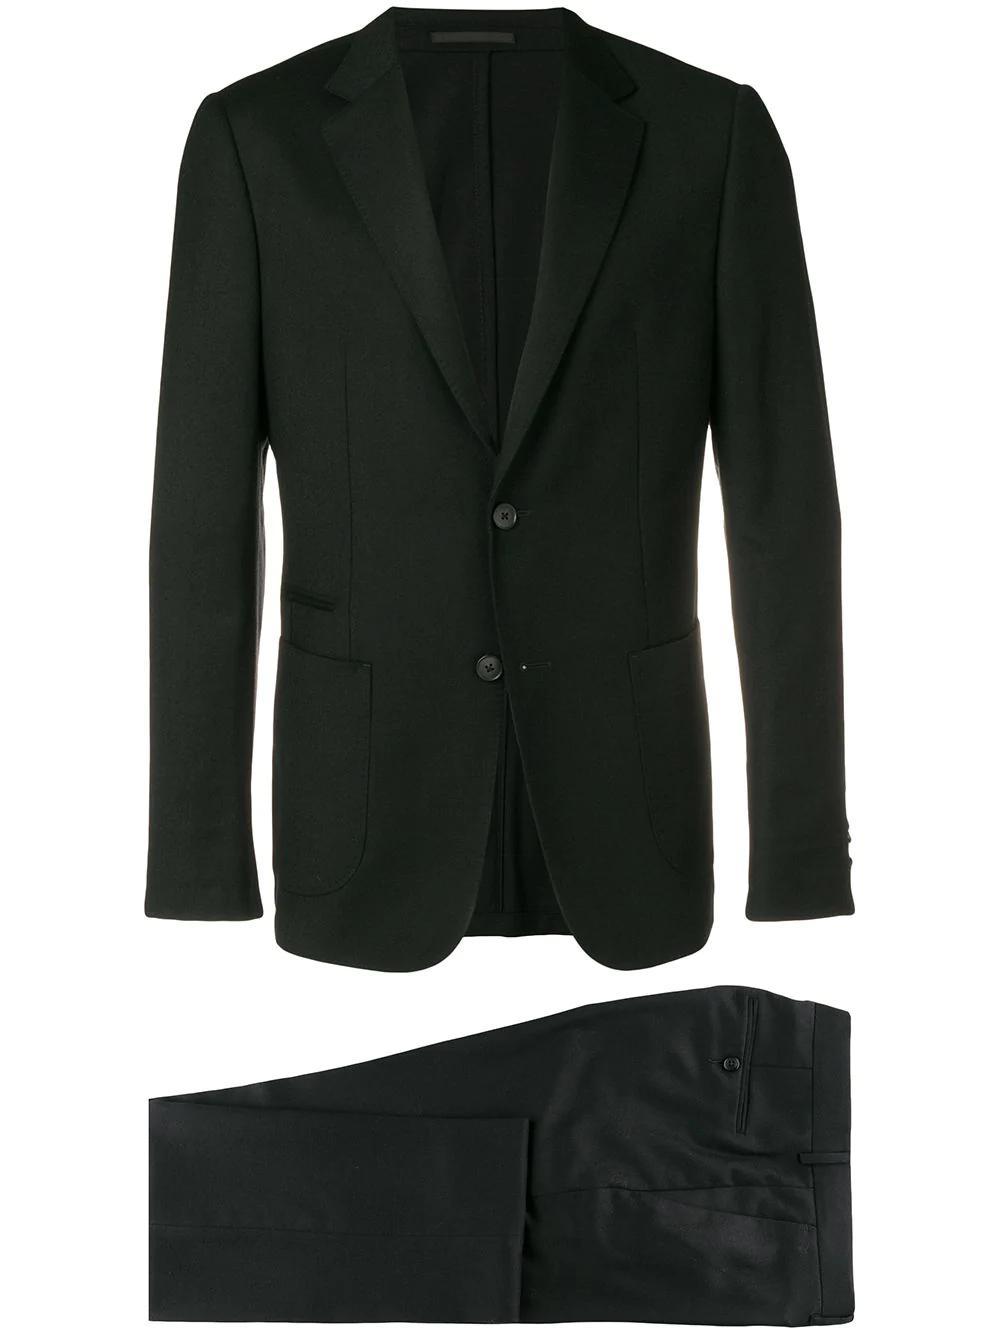 Z Zegna Schmaler Anzug - Schwarz In Black